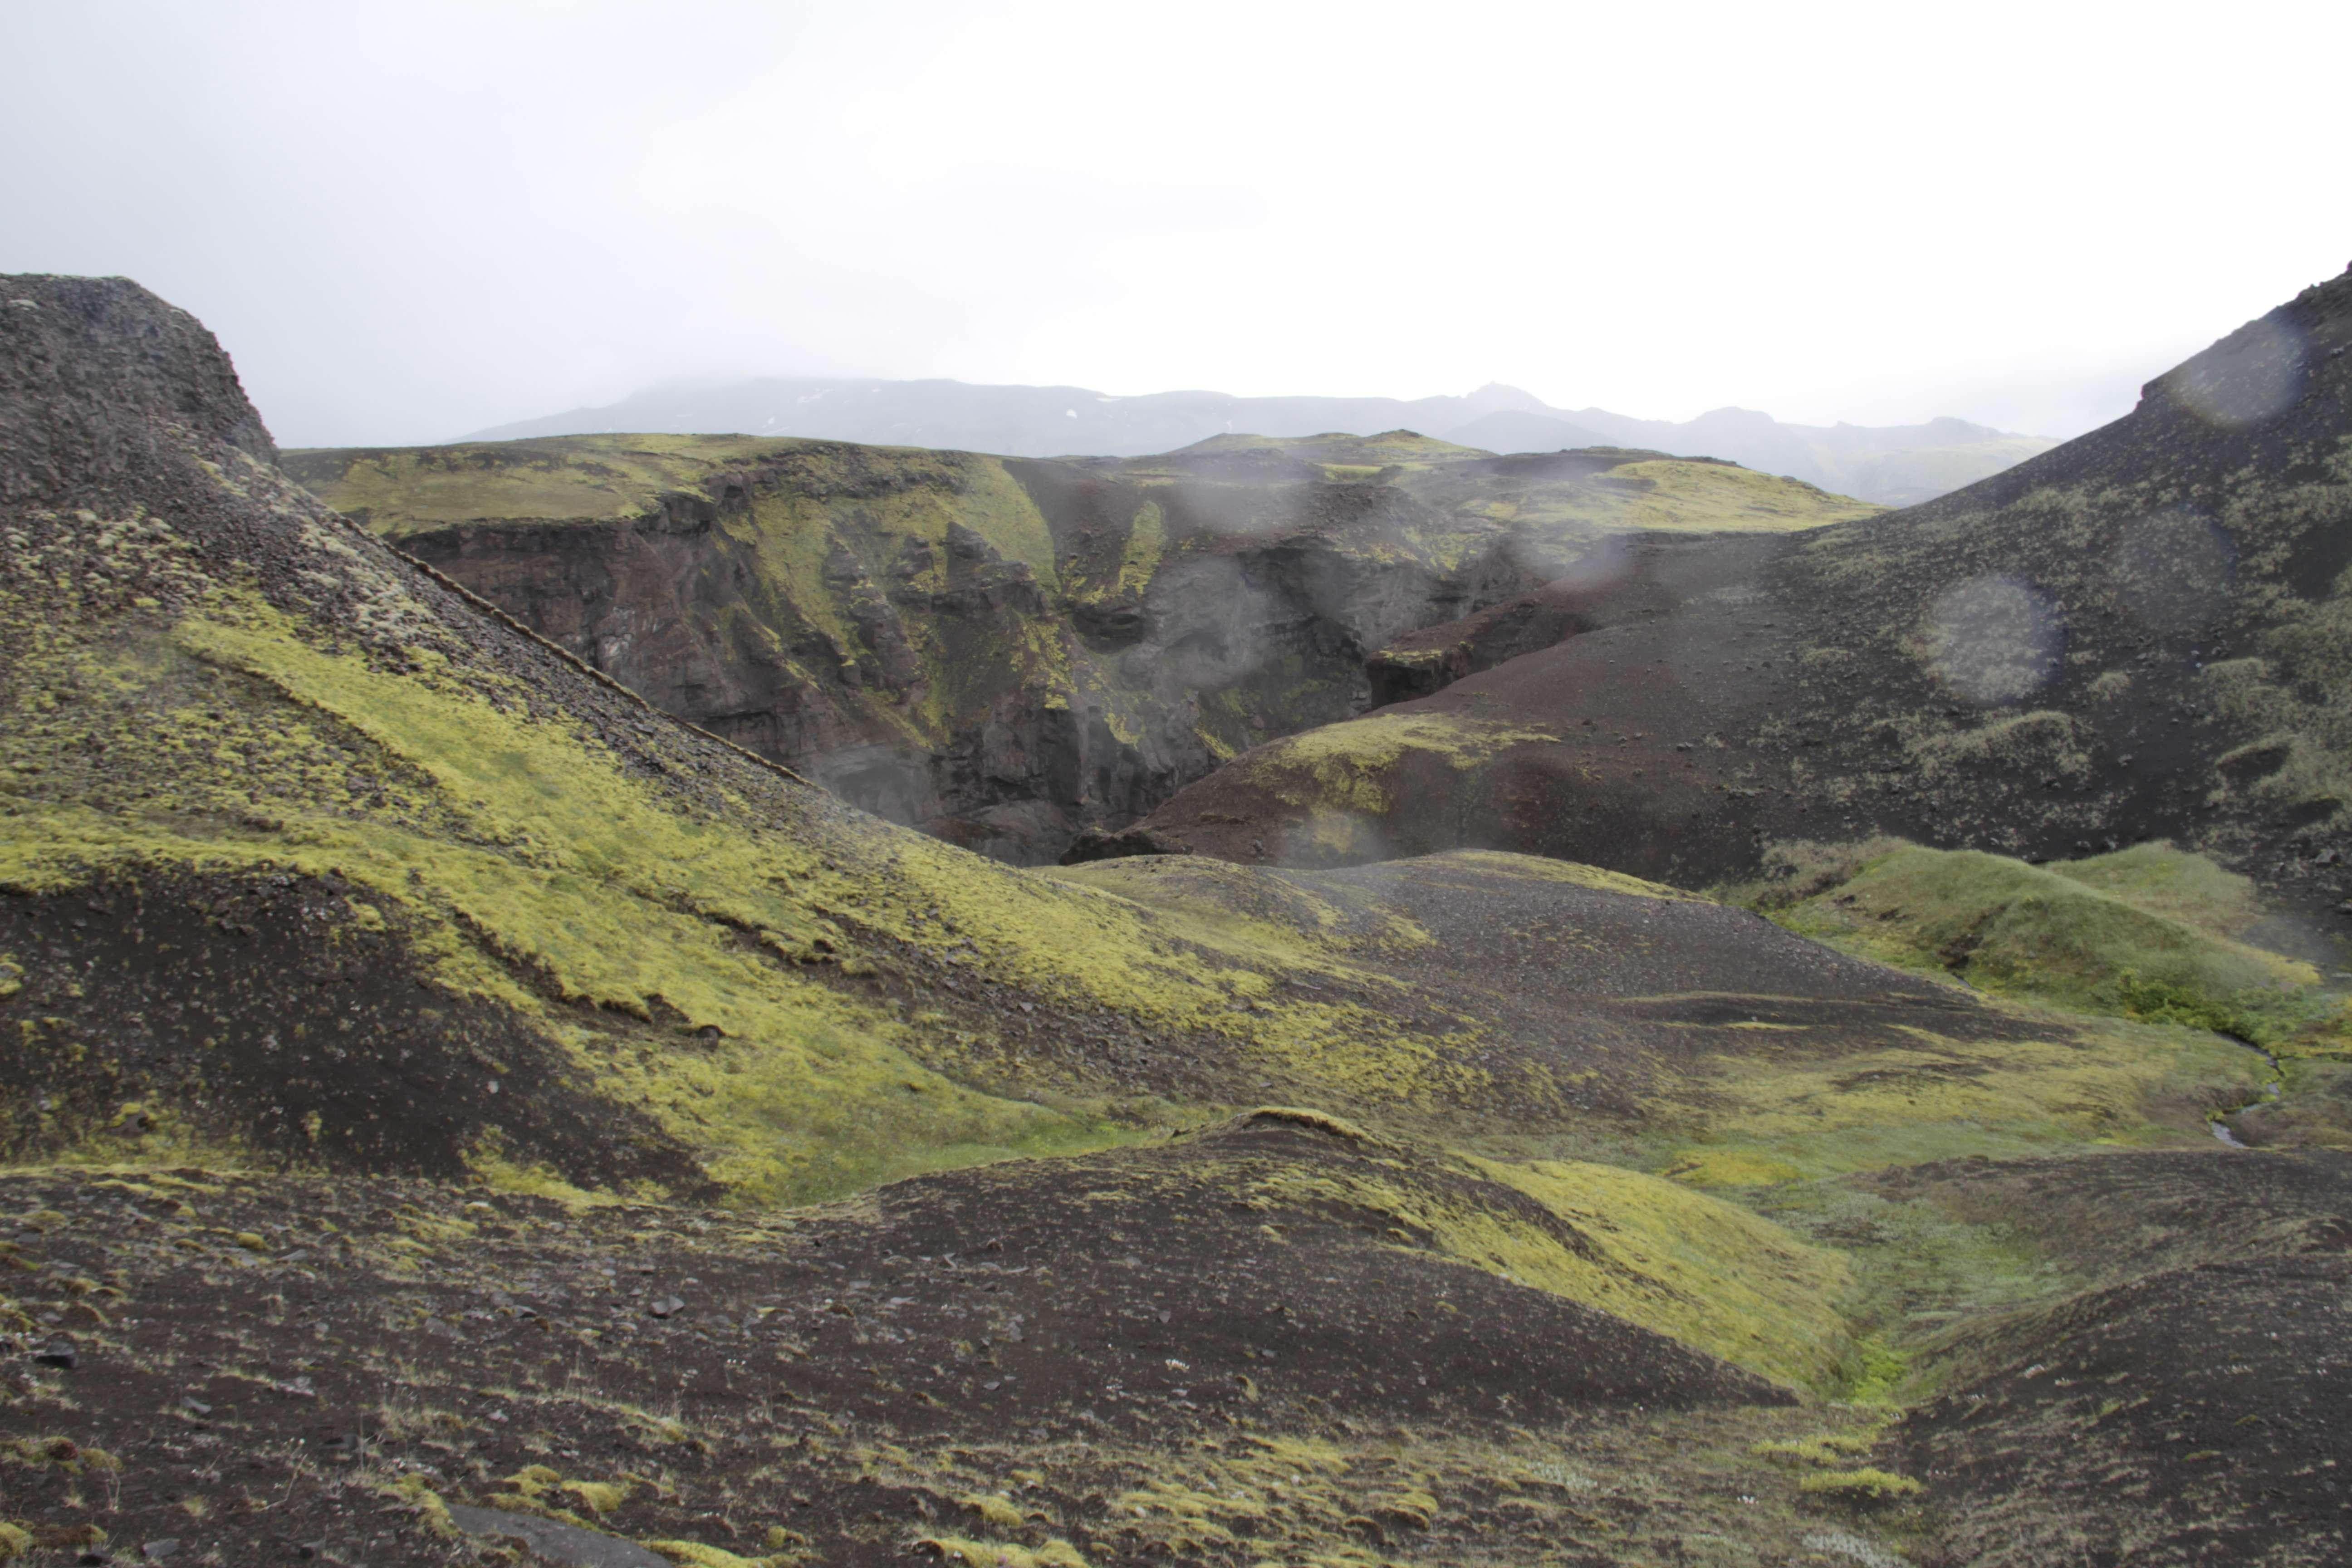 Islande_0584 trail jour 2 Emstrur - le canyon Markatflojogur 18 juillet